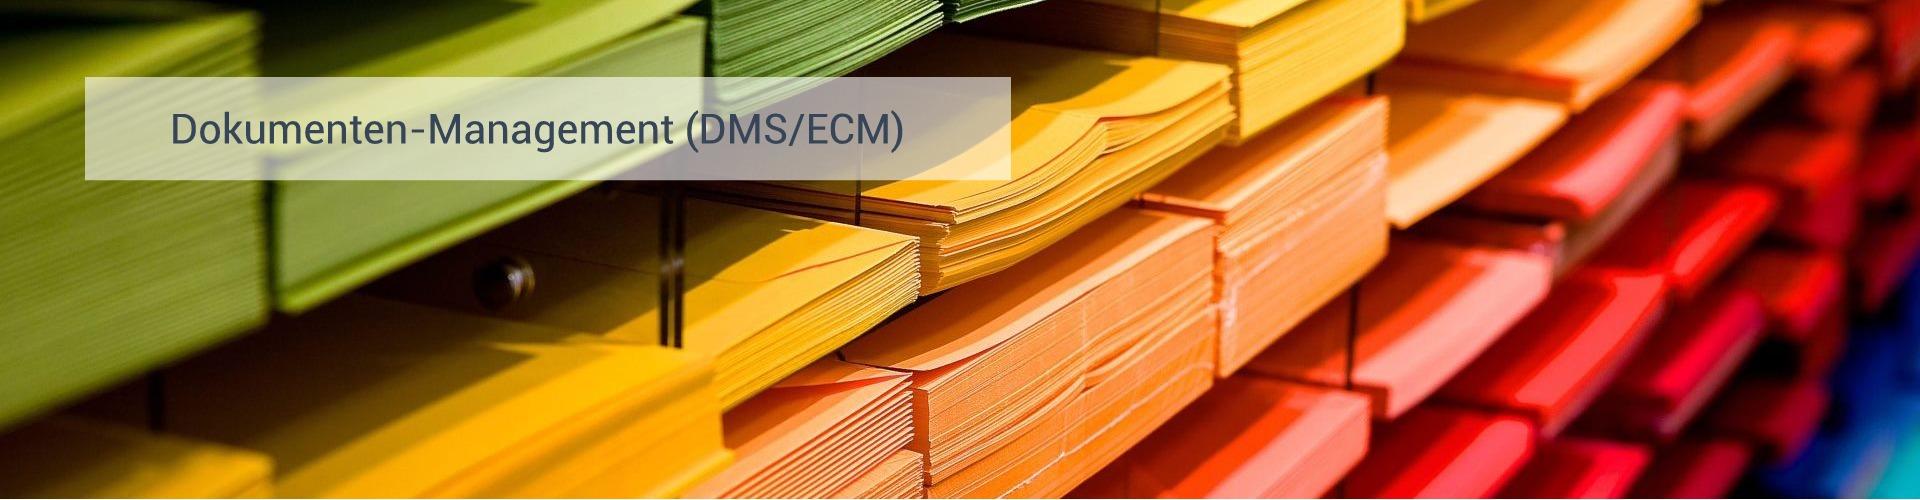 Dokumenten-Managment